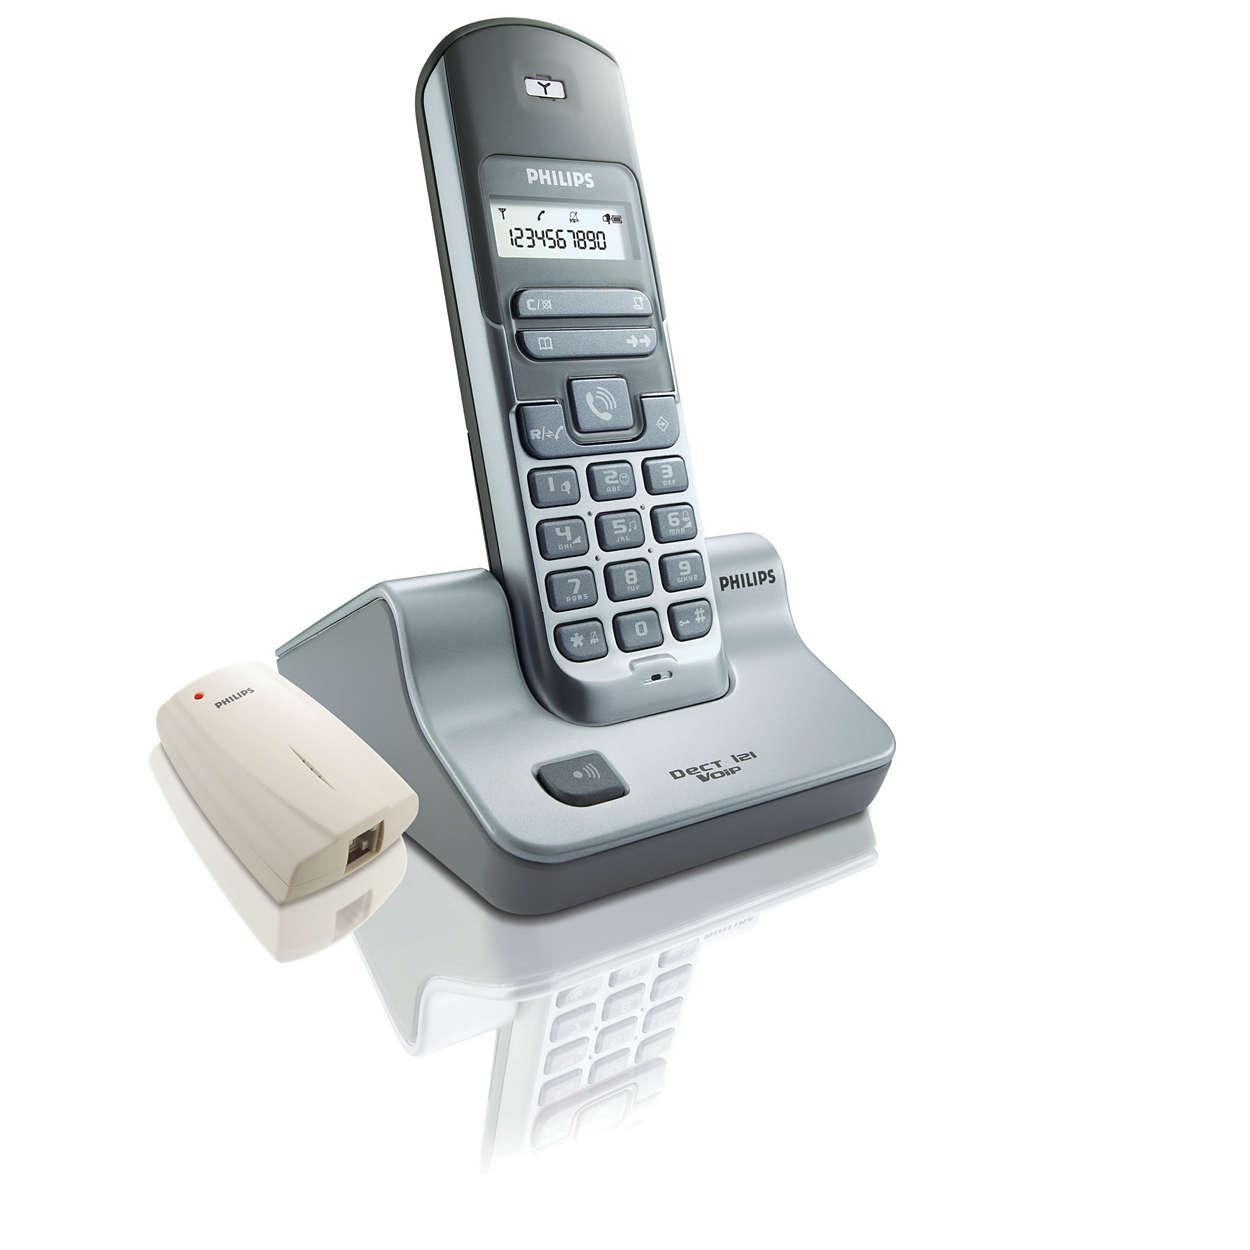 Gratis internettelefoni, der ganske enkelt fungerer